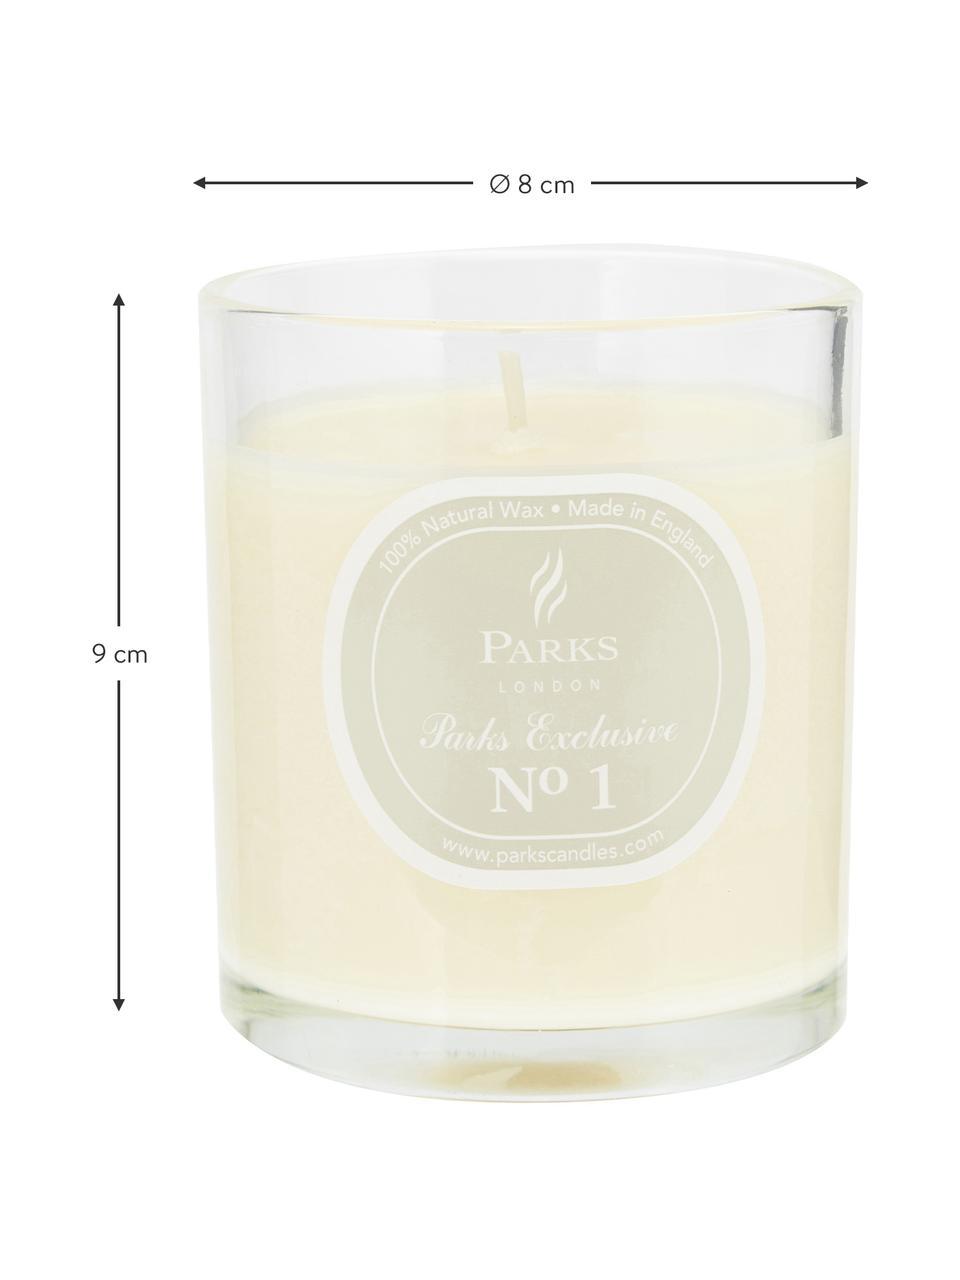 Duftkerze Exclusive No 1 (Sandelholz & Vanille), Behälter: Milchglas, Sandelholz & Vanille, Ø 8 x H 9 cm